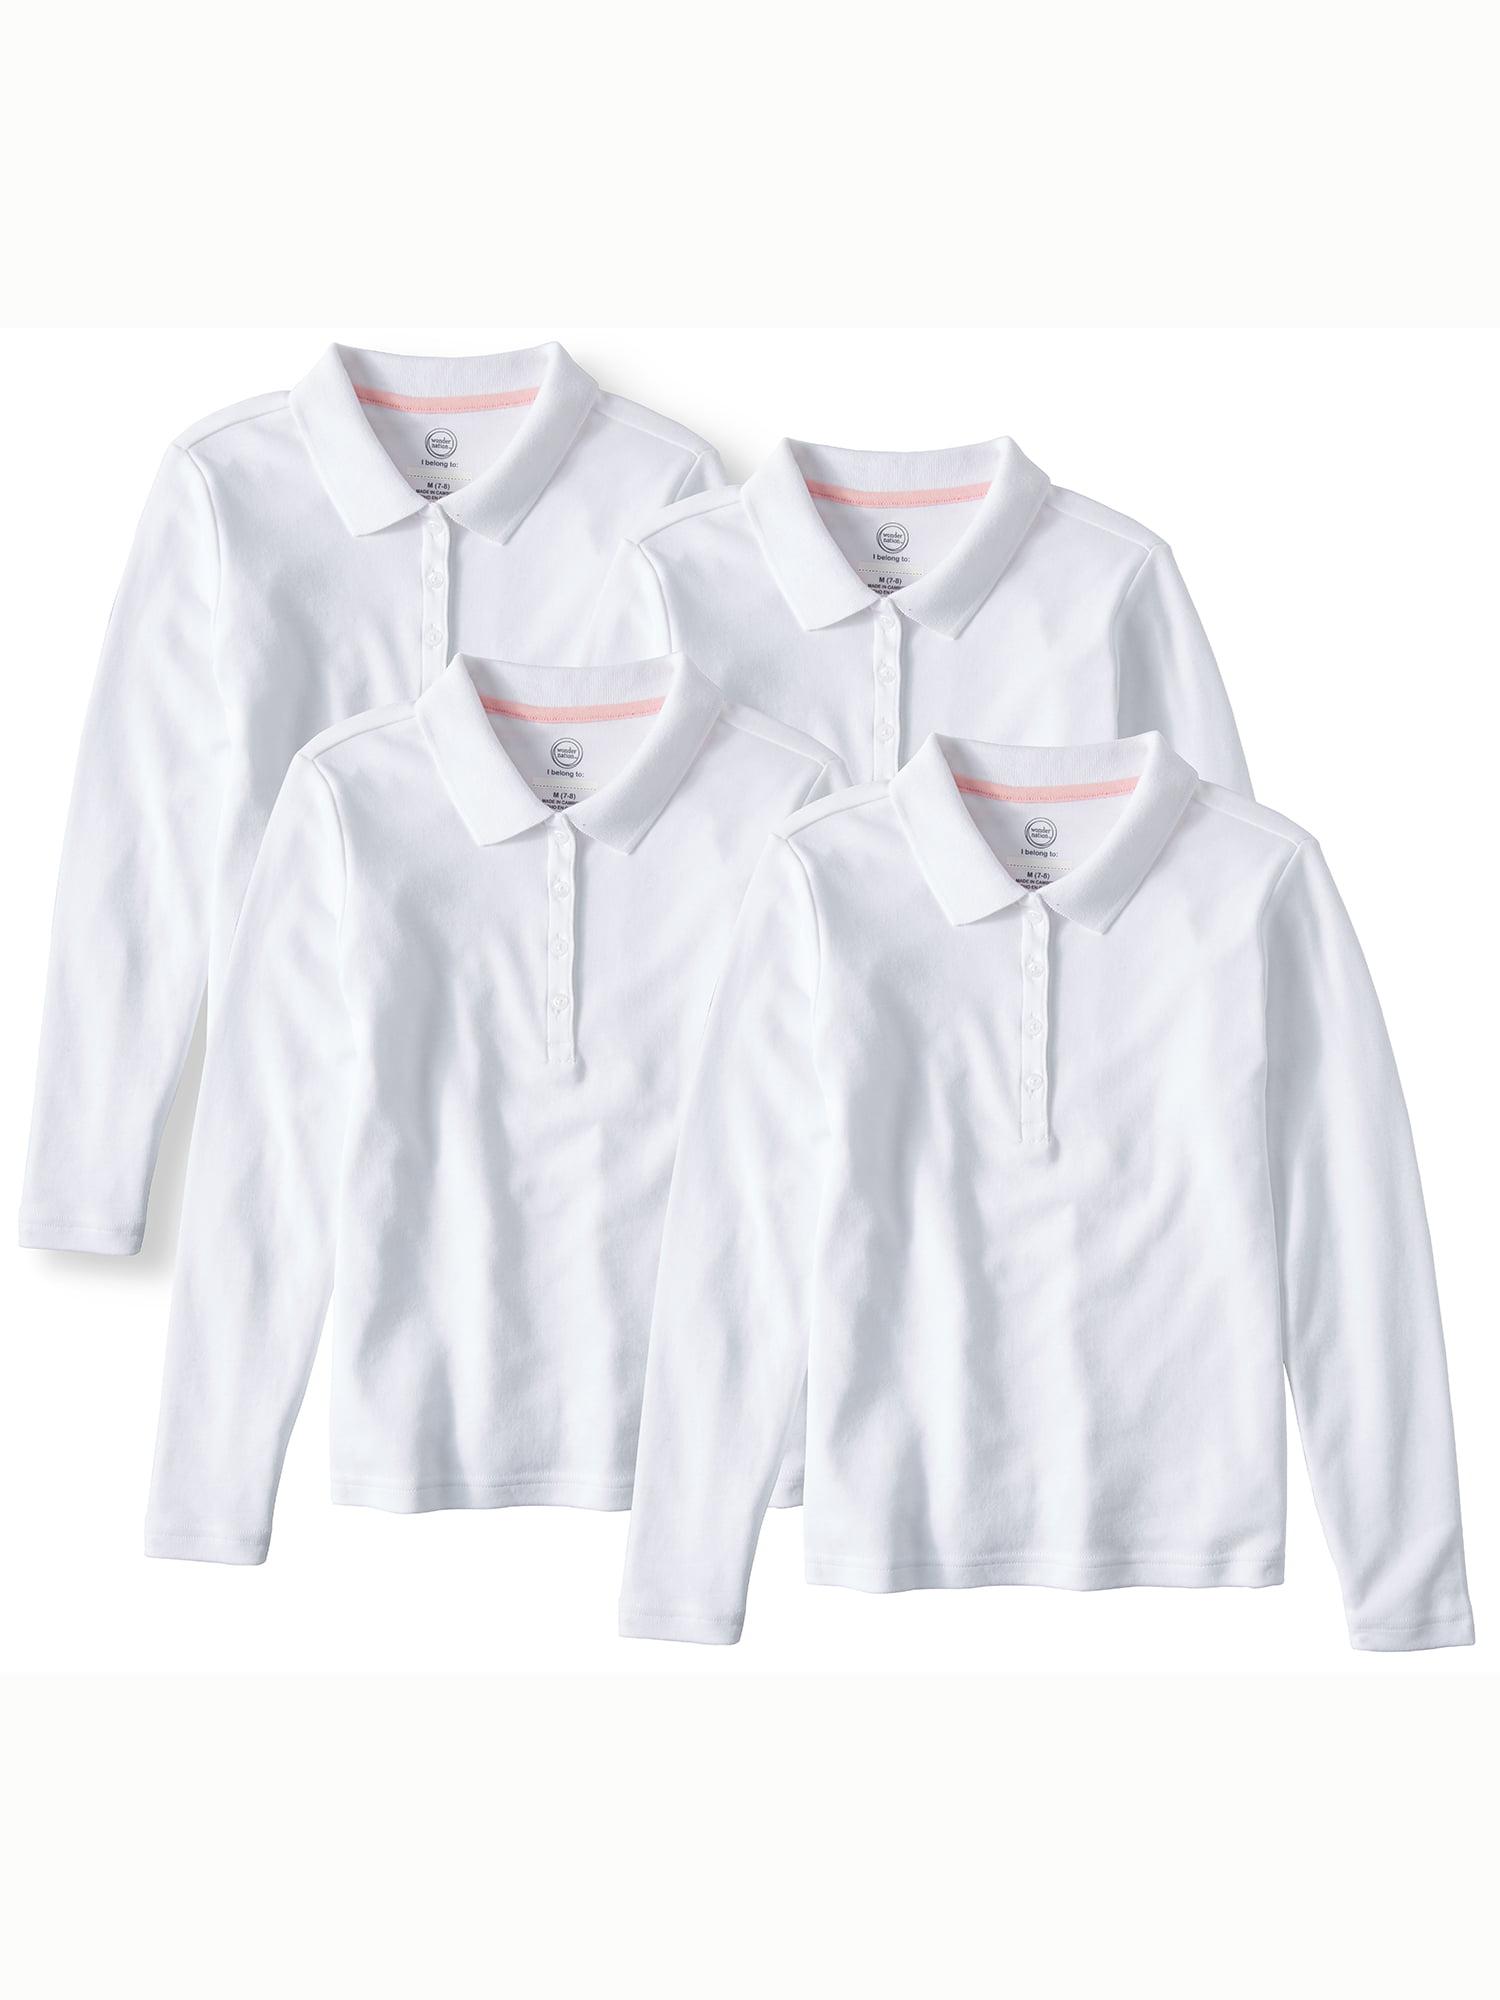 Wonder Nation Girls School Uniform Long Sleeve Interlock Polo, 4-Pack Value Bundle